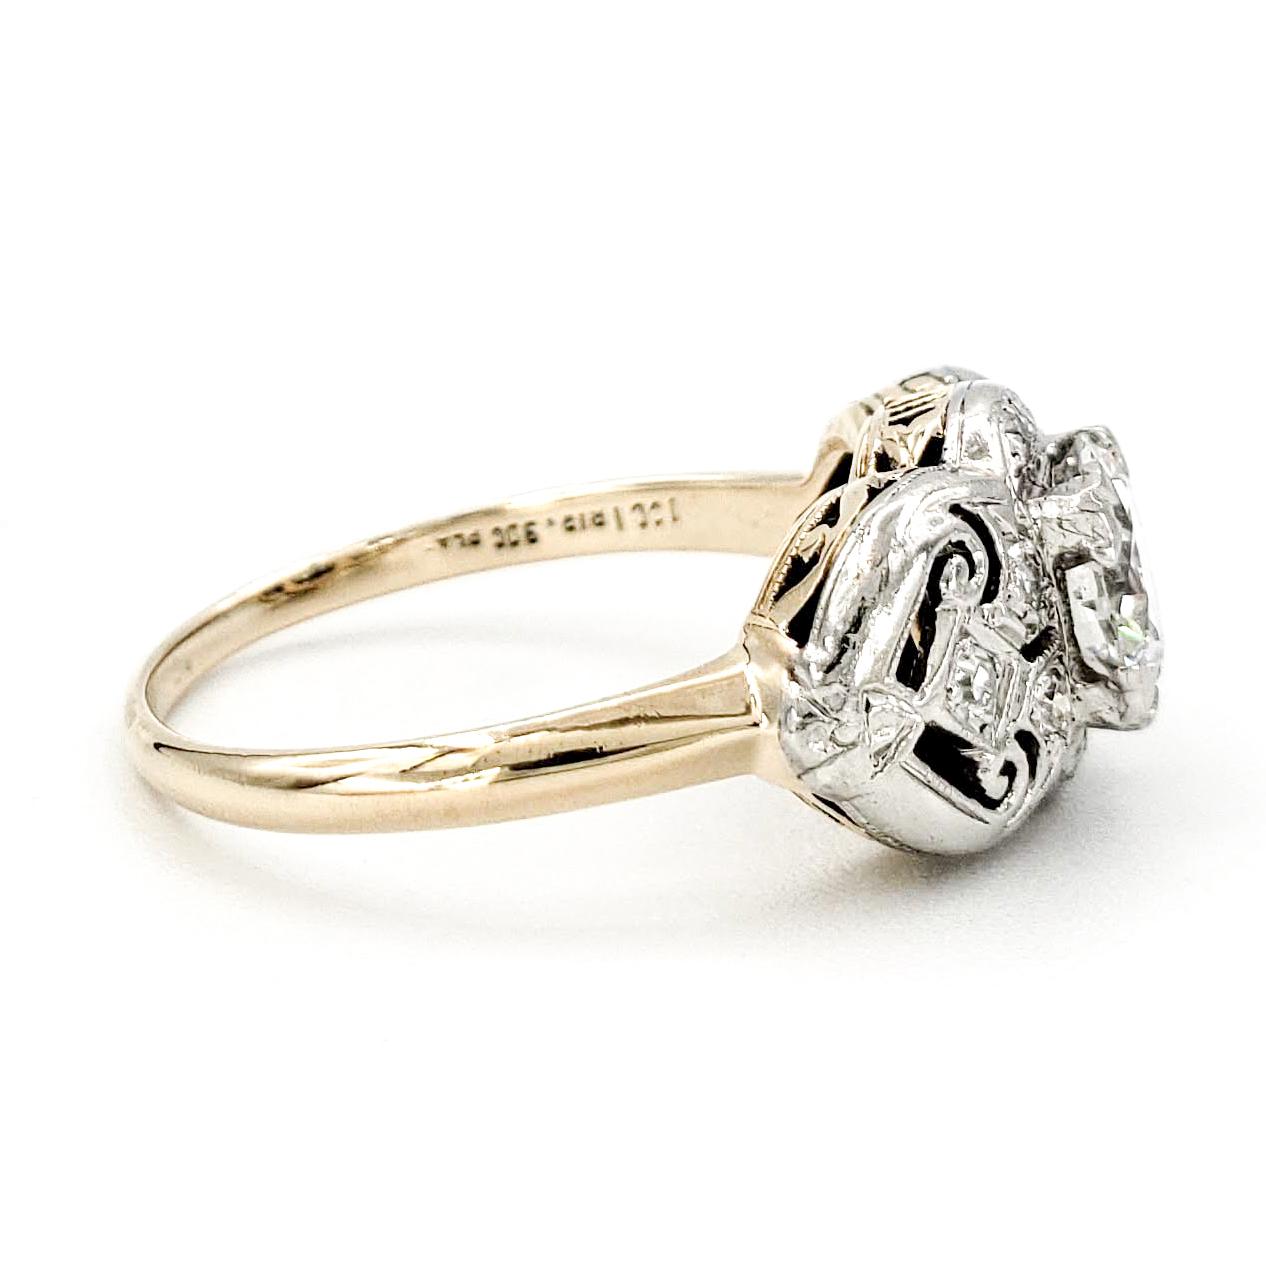 vintage-14-karat-gold-engagement-ring-with-0-67-carat-old-european-cut-diamond-egl-f-vs2